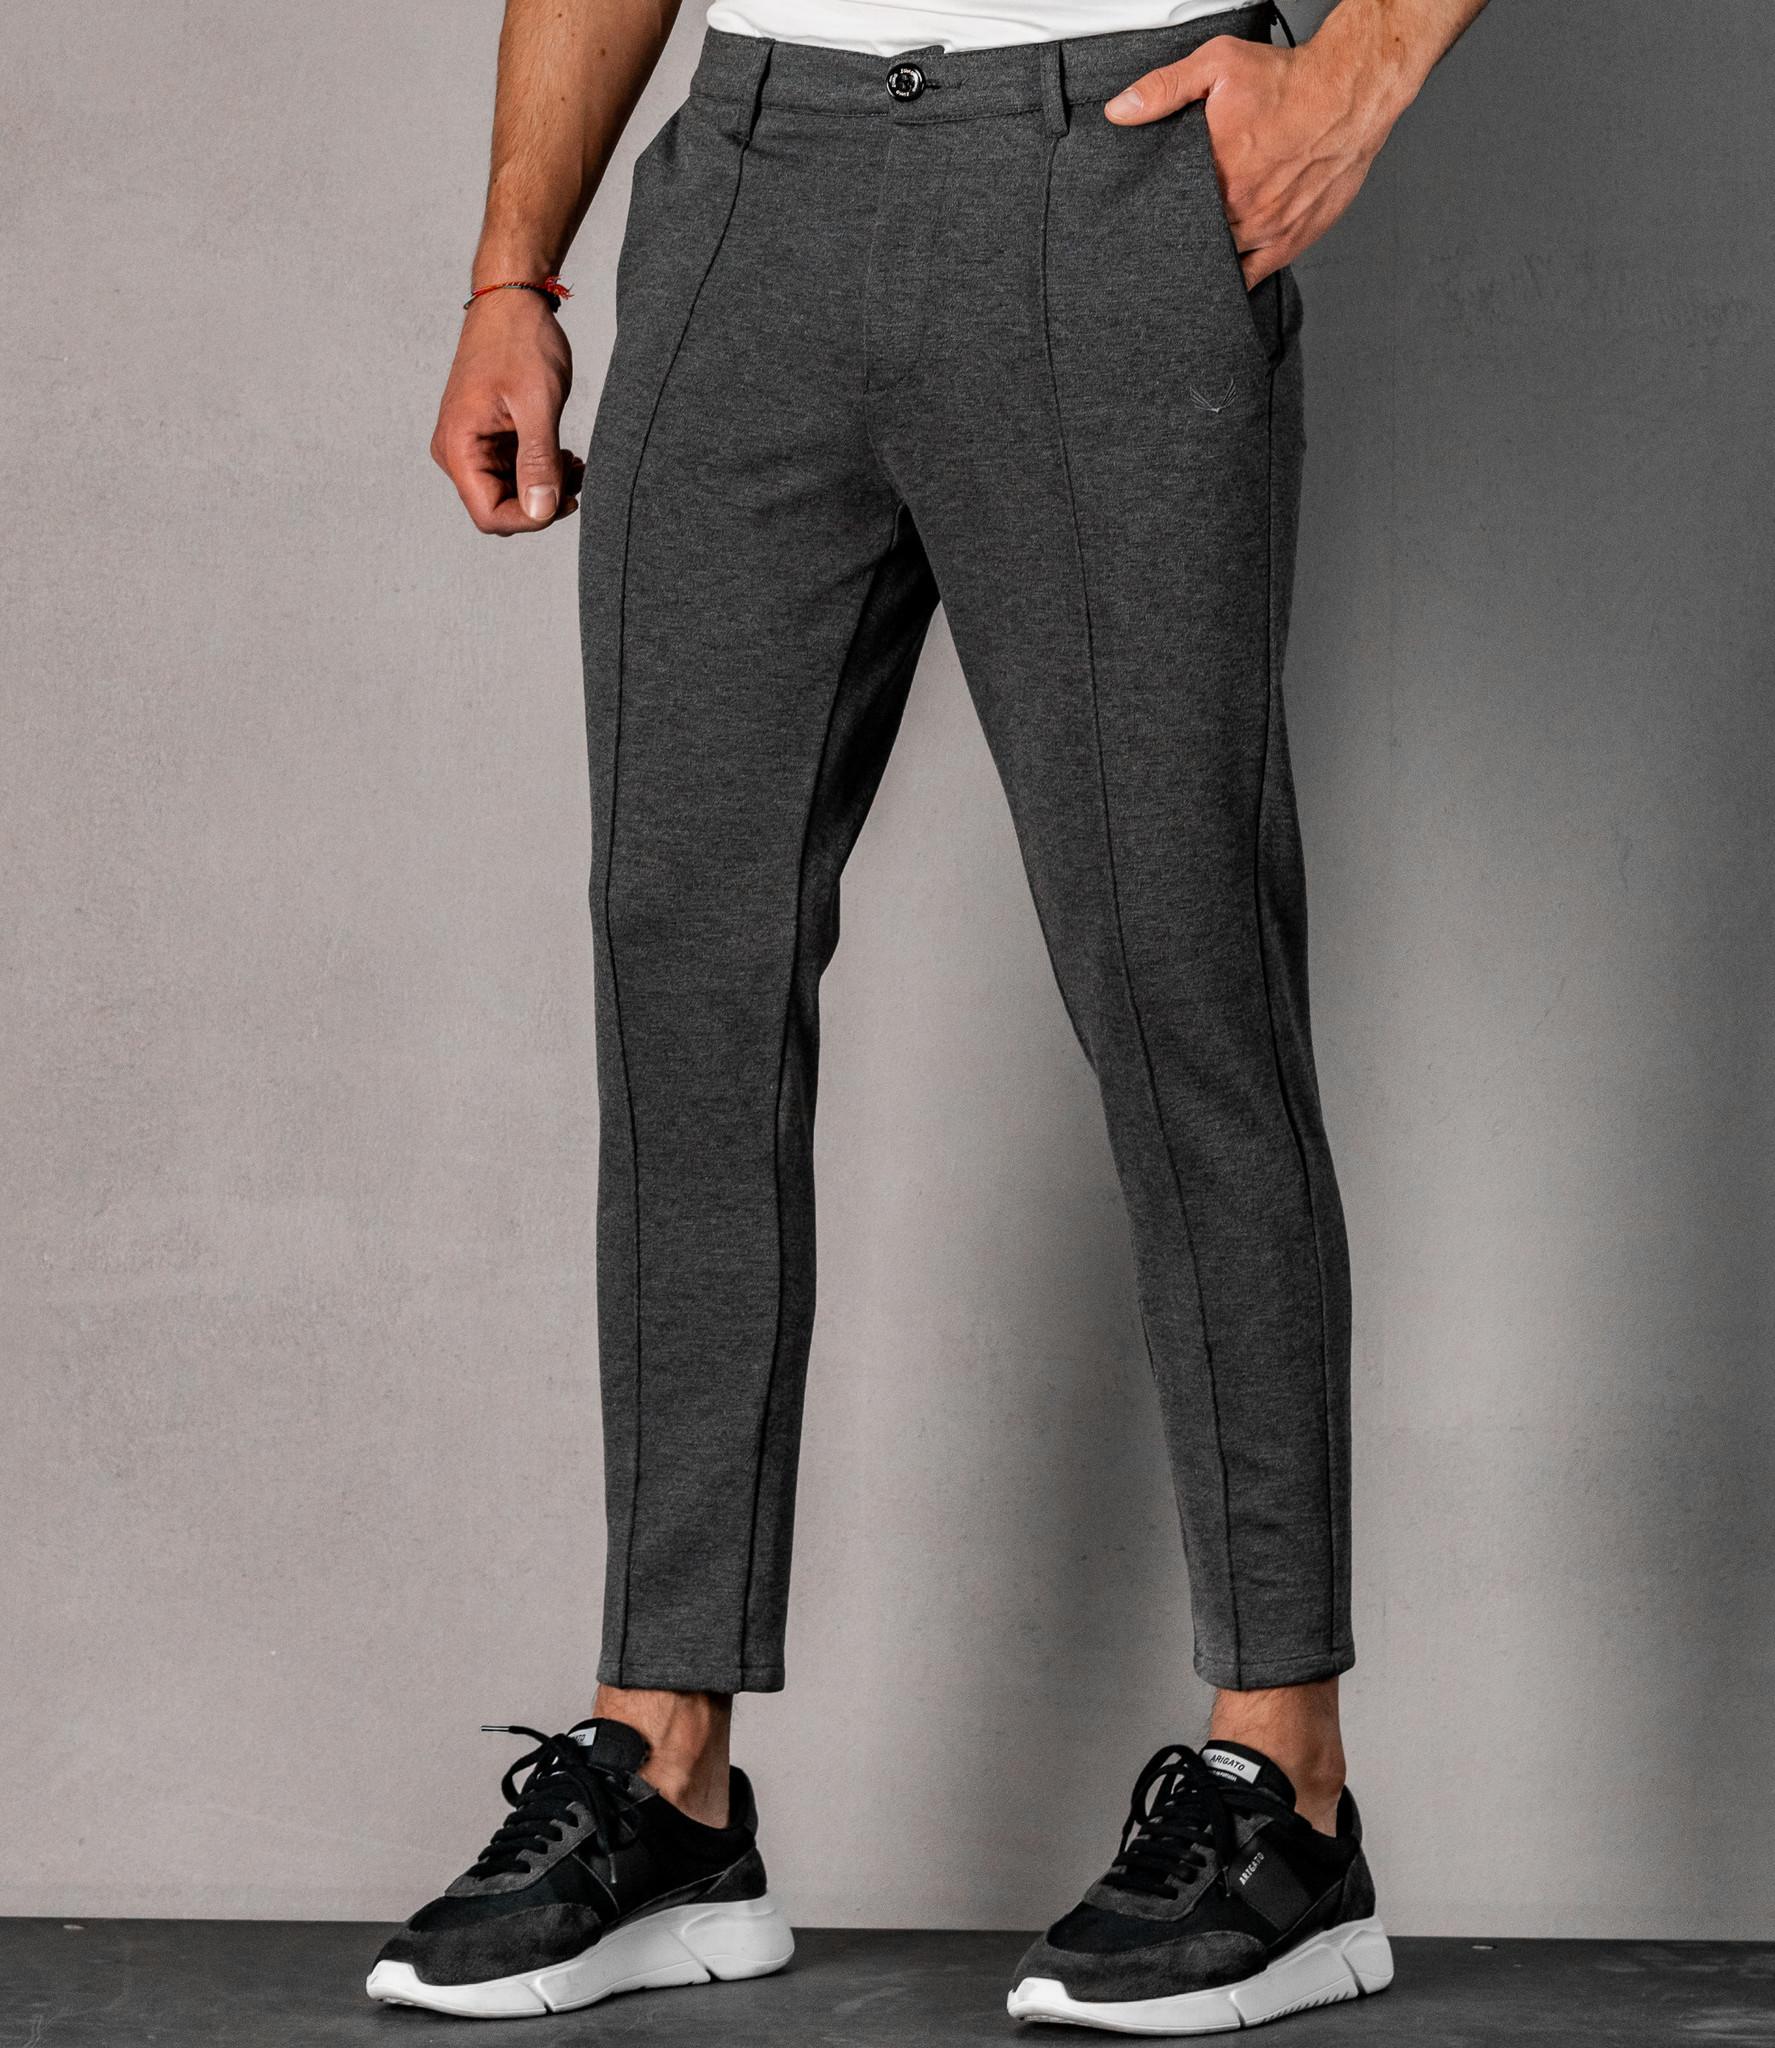 Zumo Slim Fit Pants ZEDD-PM Grey